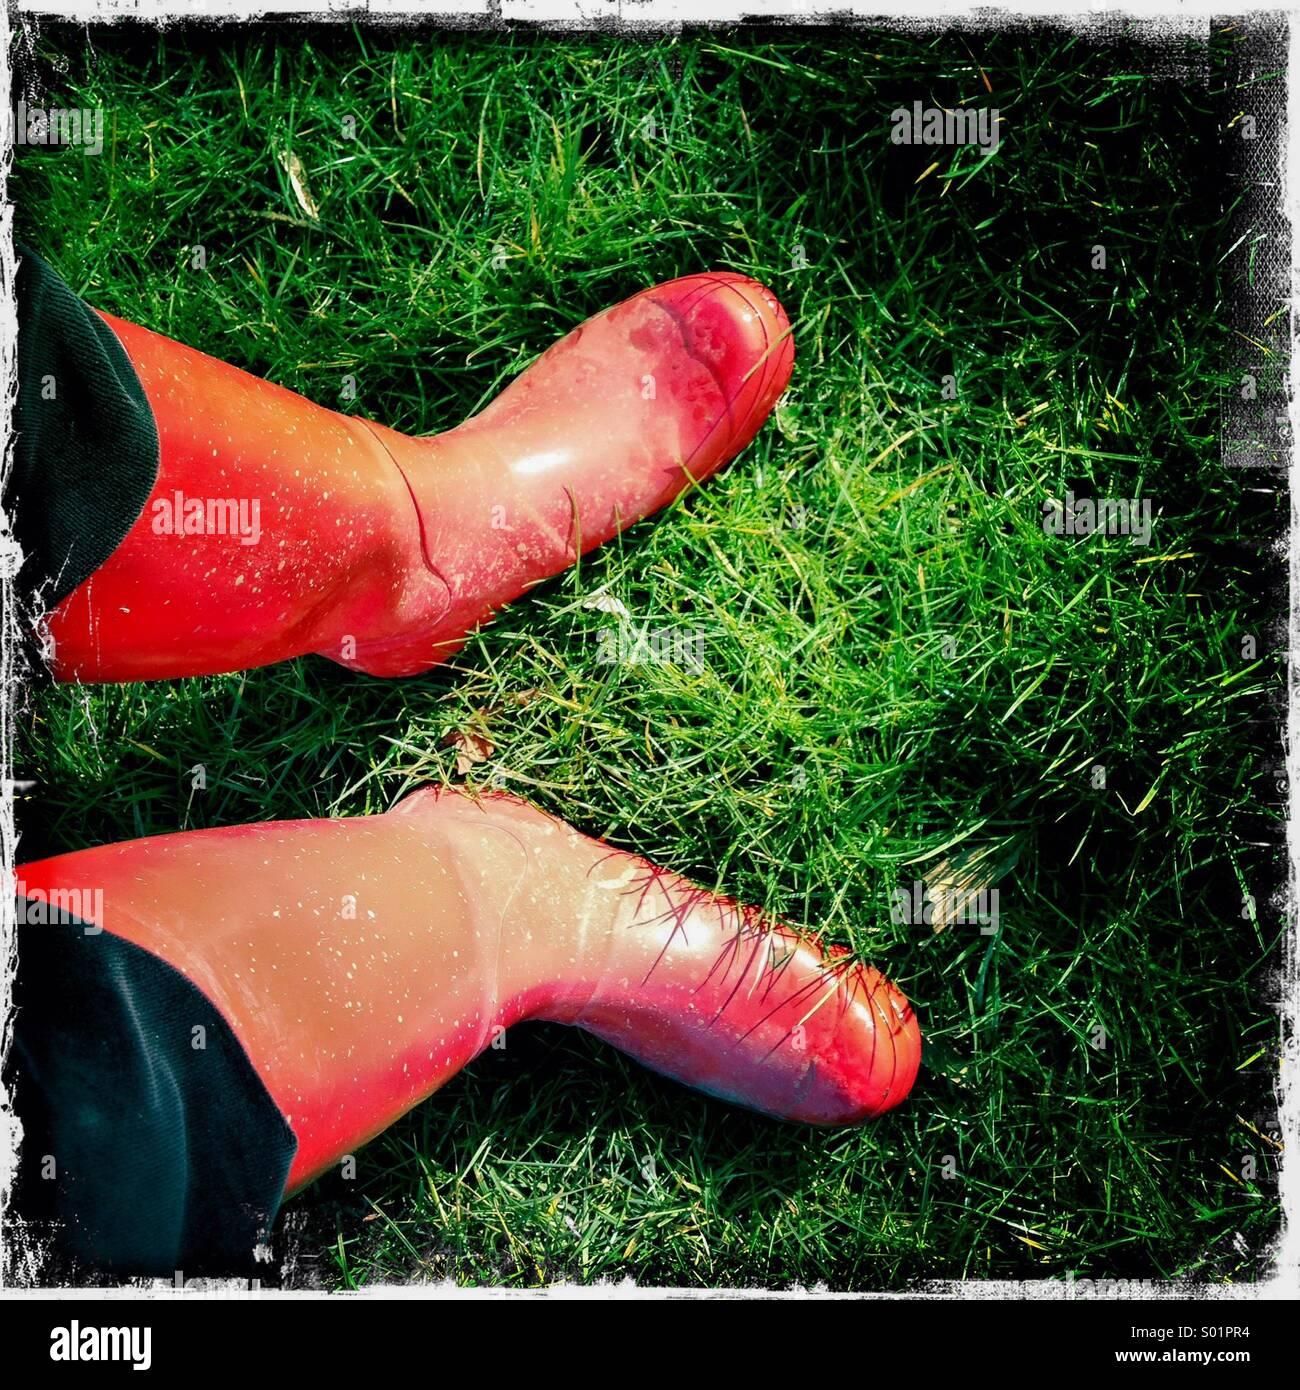 Schlammigen rot Wellington boots auf nassen, durchnässten Rasen. Hipstamatic iPhone. Stockbild